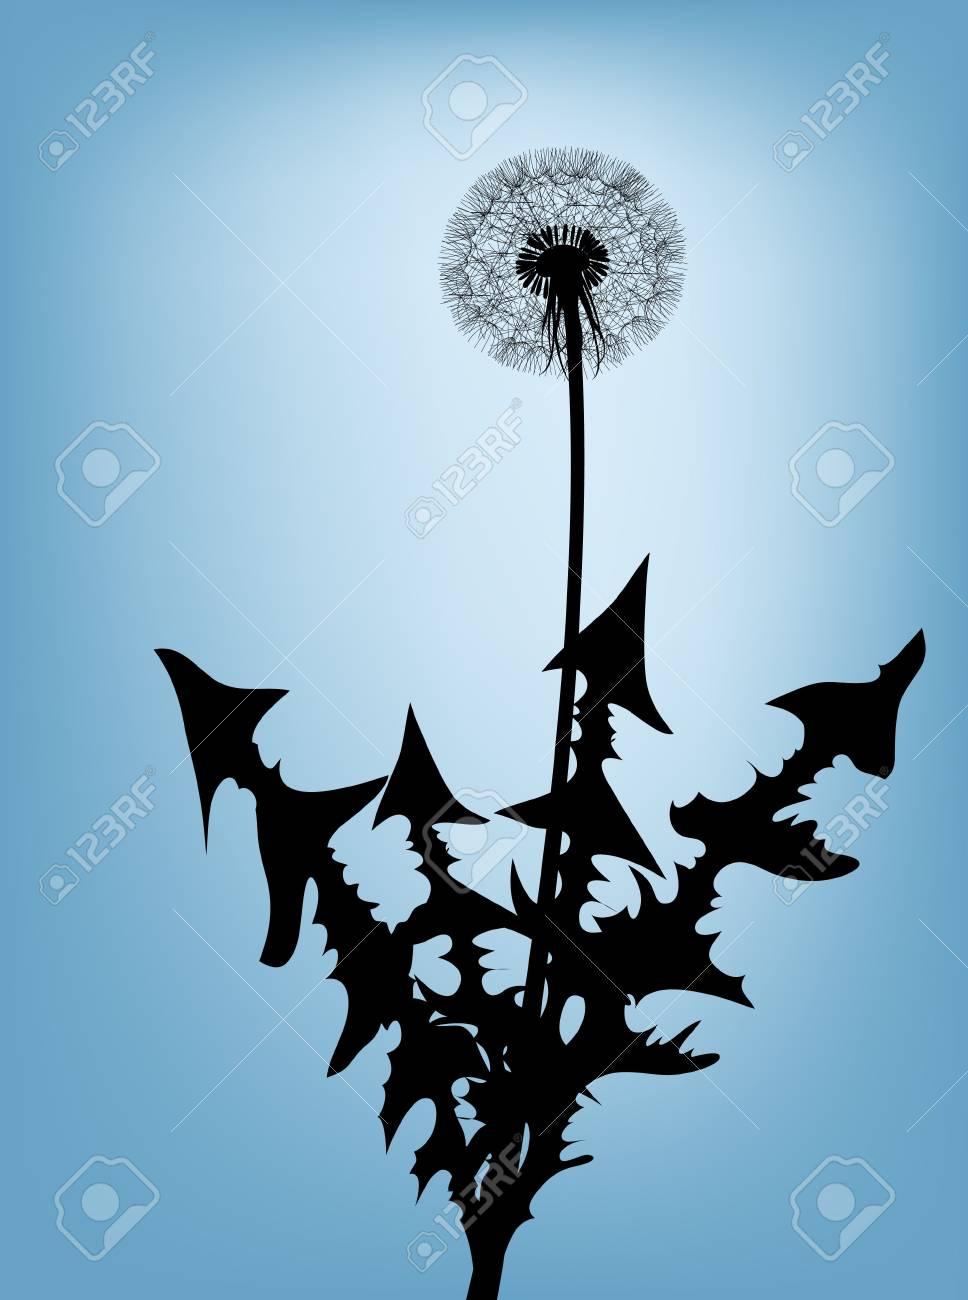 Dandelion silhouette against the blue sky Stock Photo - 4858060